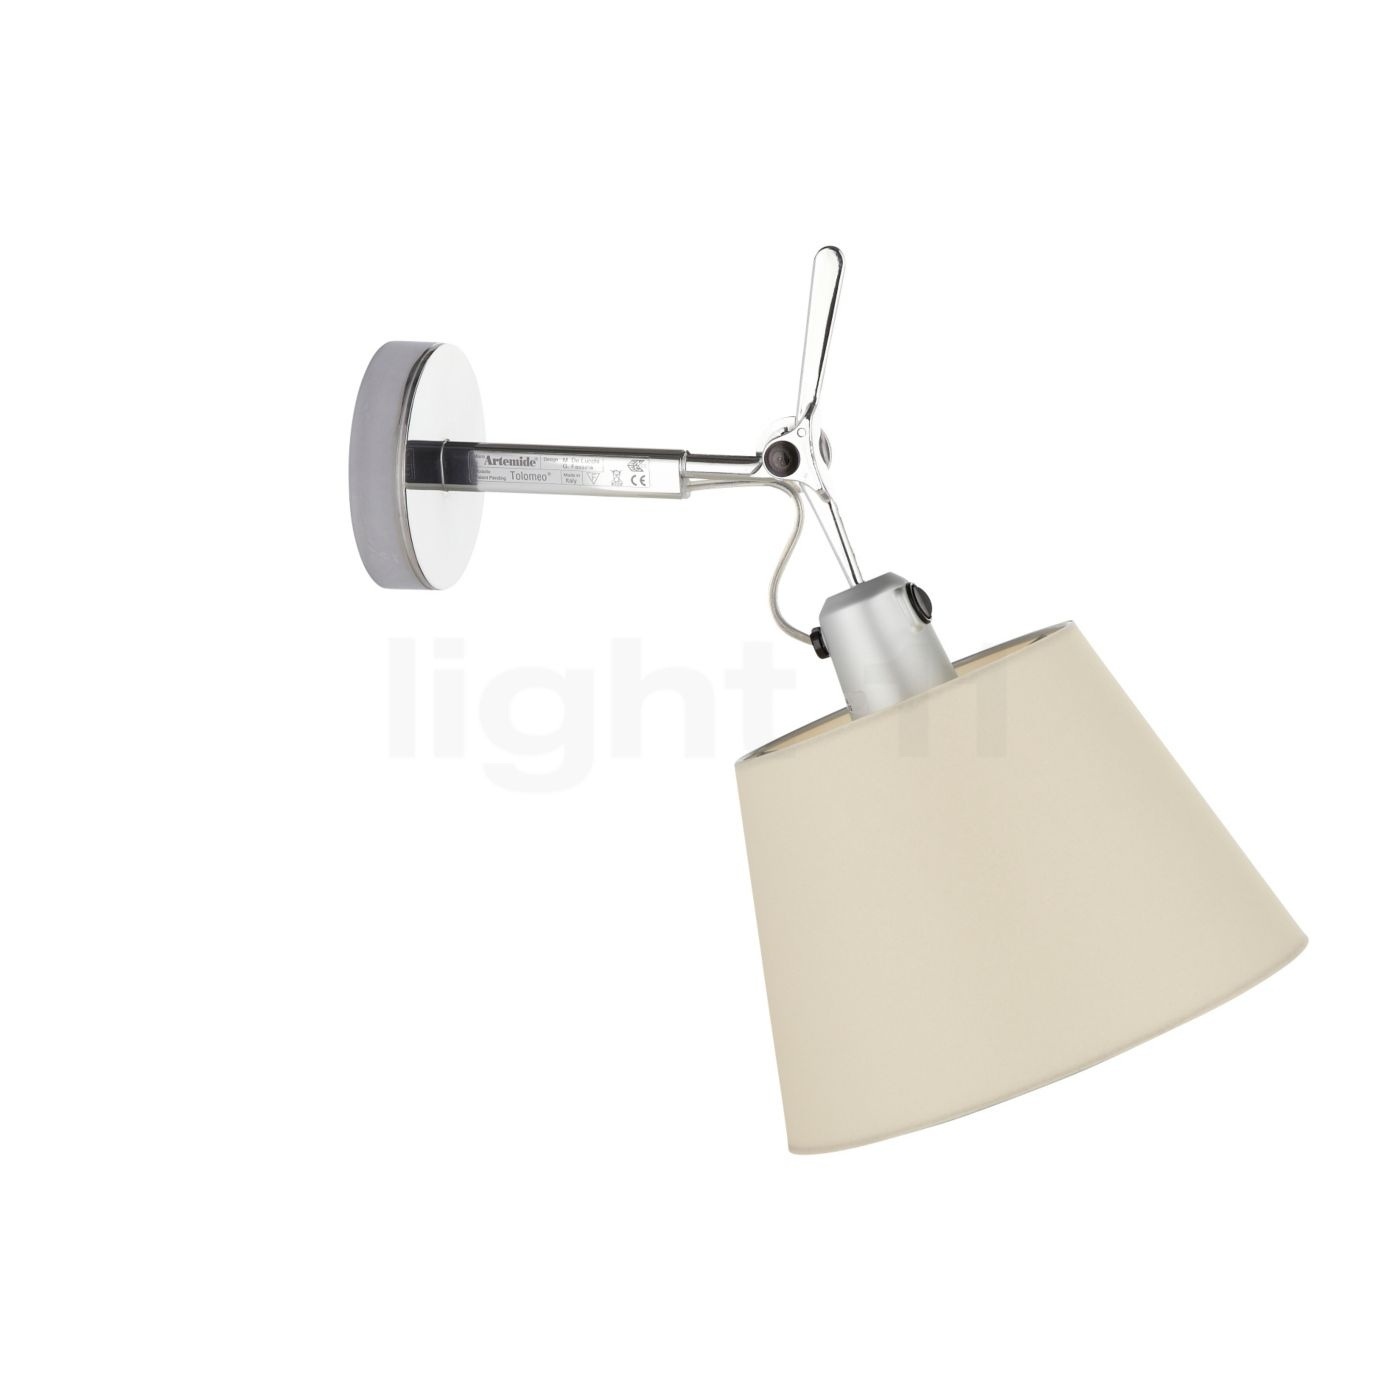 Artemide Tolomeo Parete Diffuser Wall Lights   Light11.eu